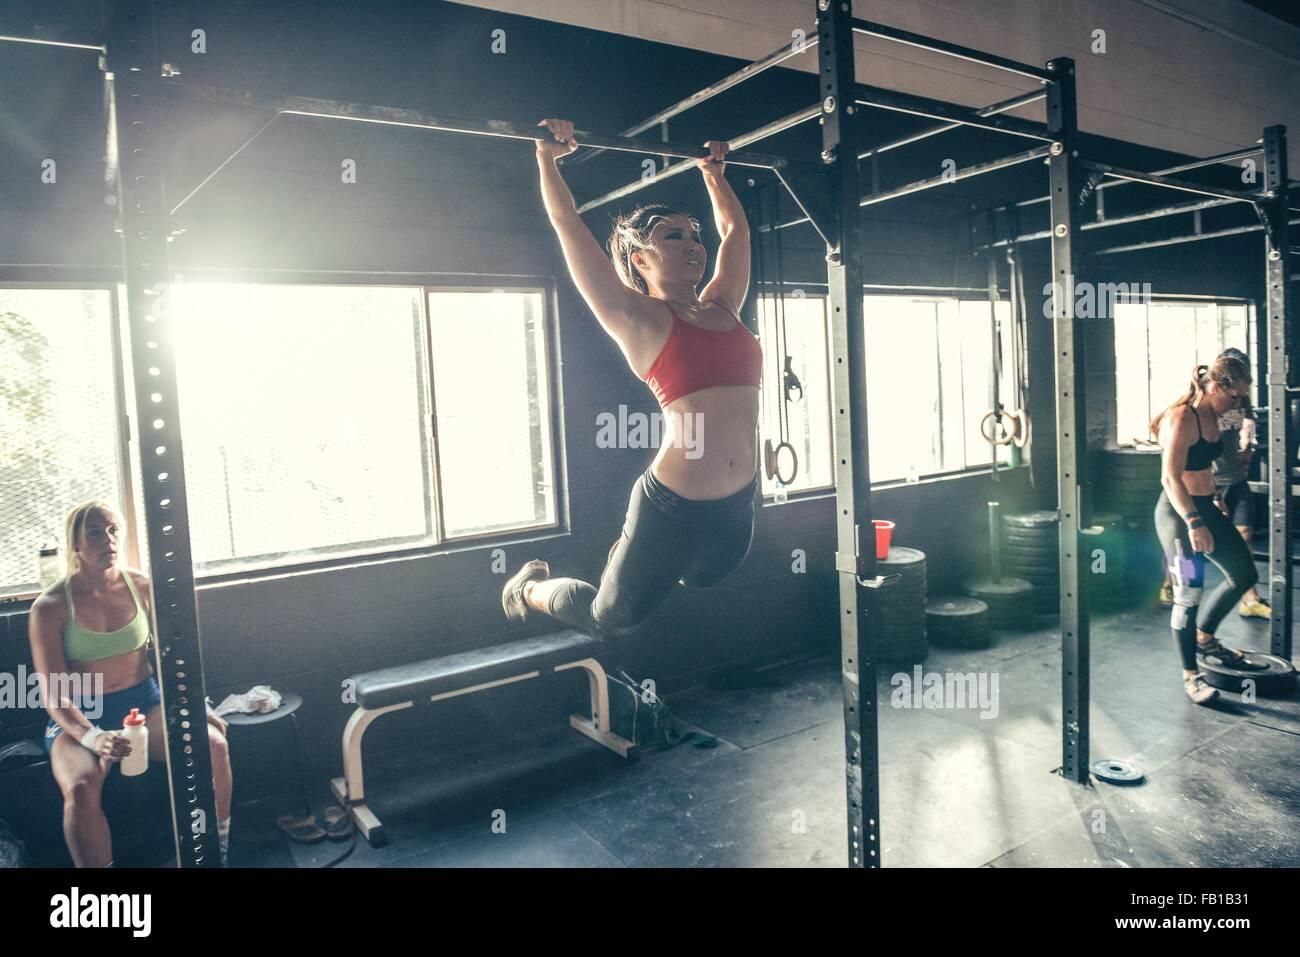 Frau schwingen auf Übung Bar im Fitness-Studio Stockbild